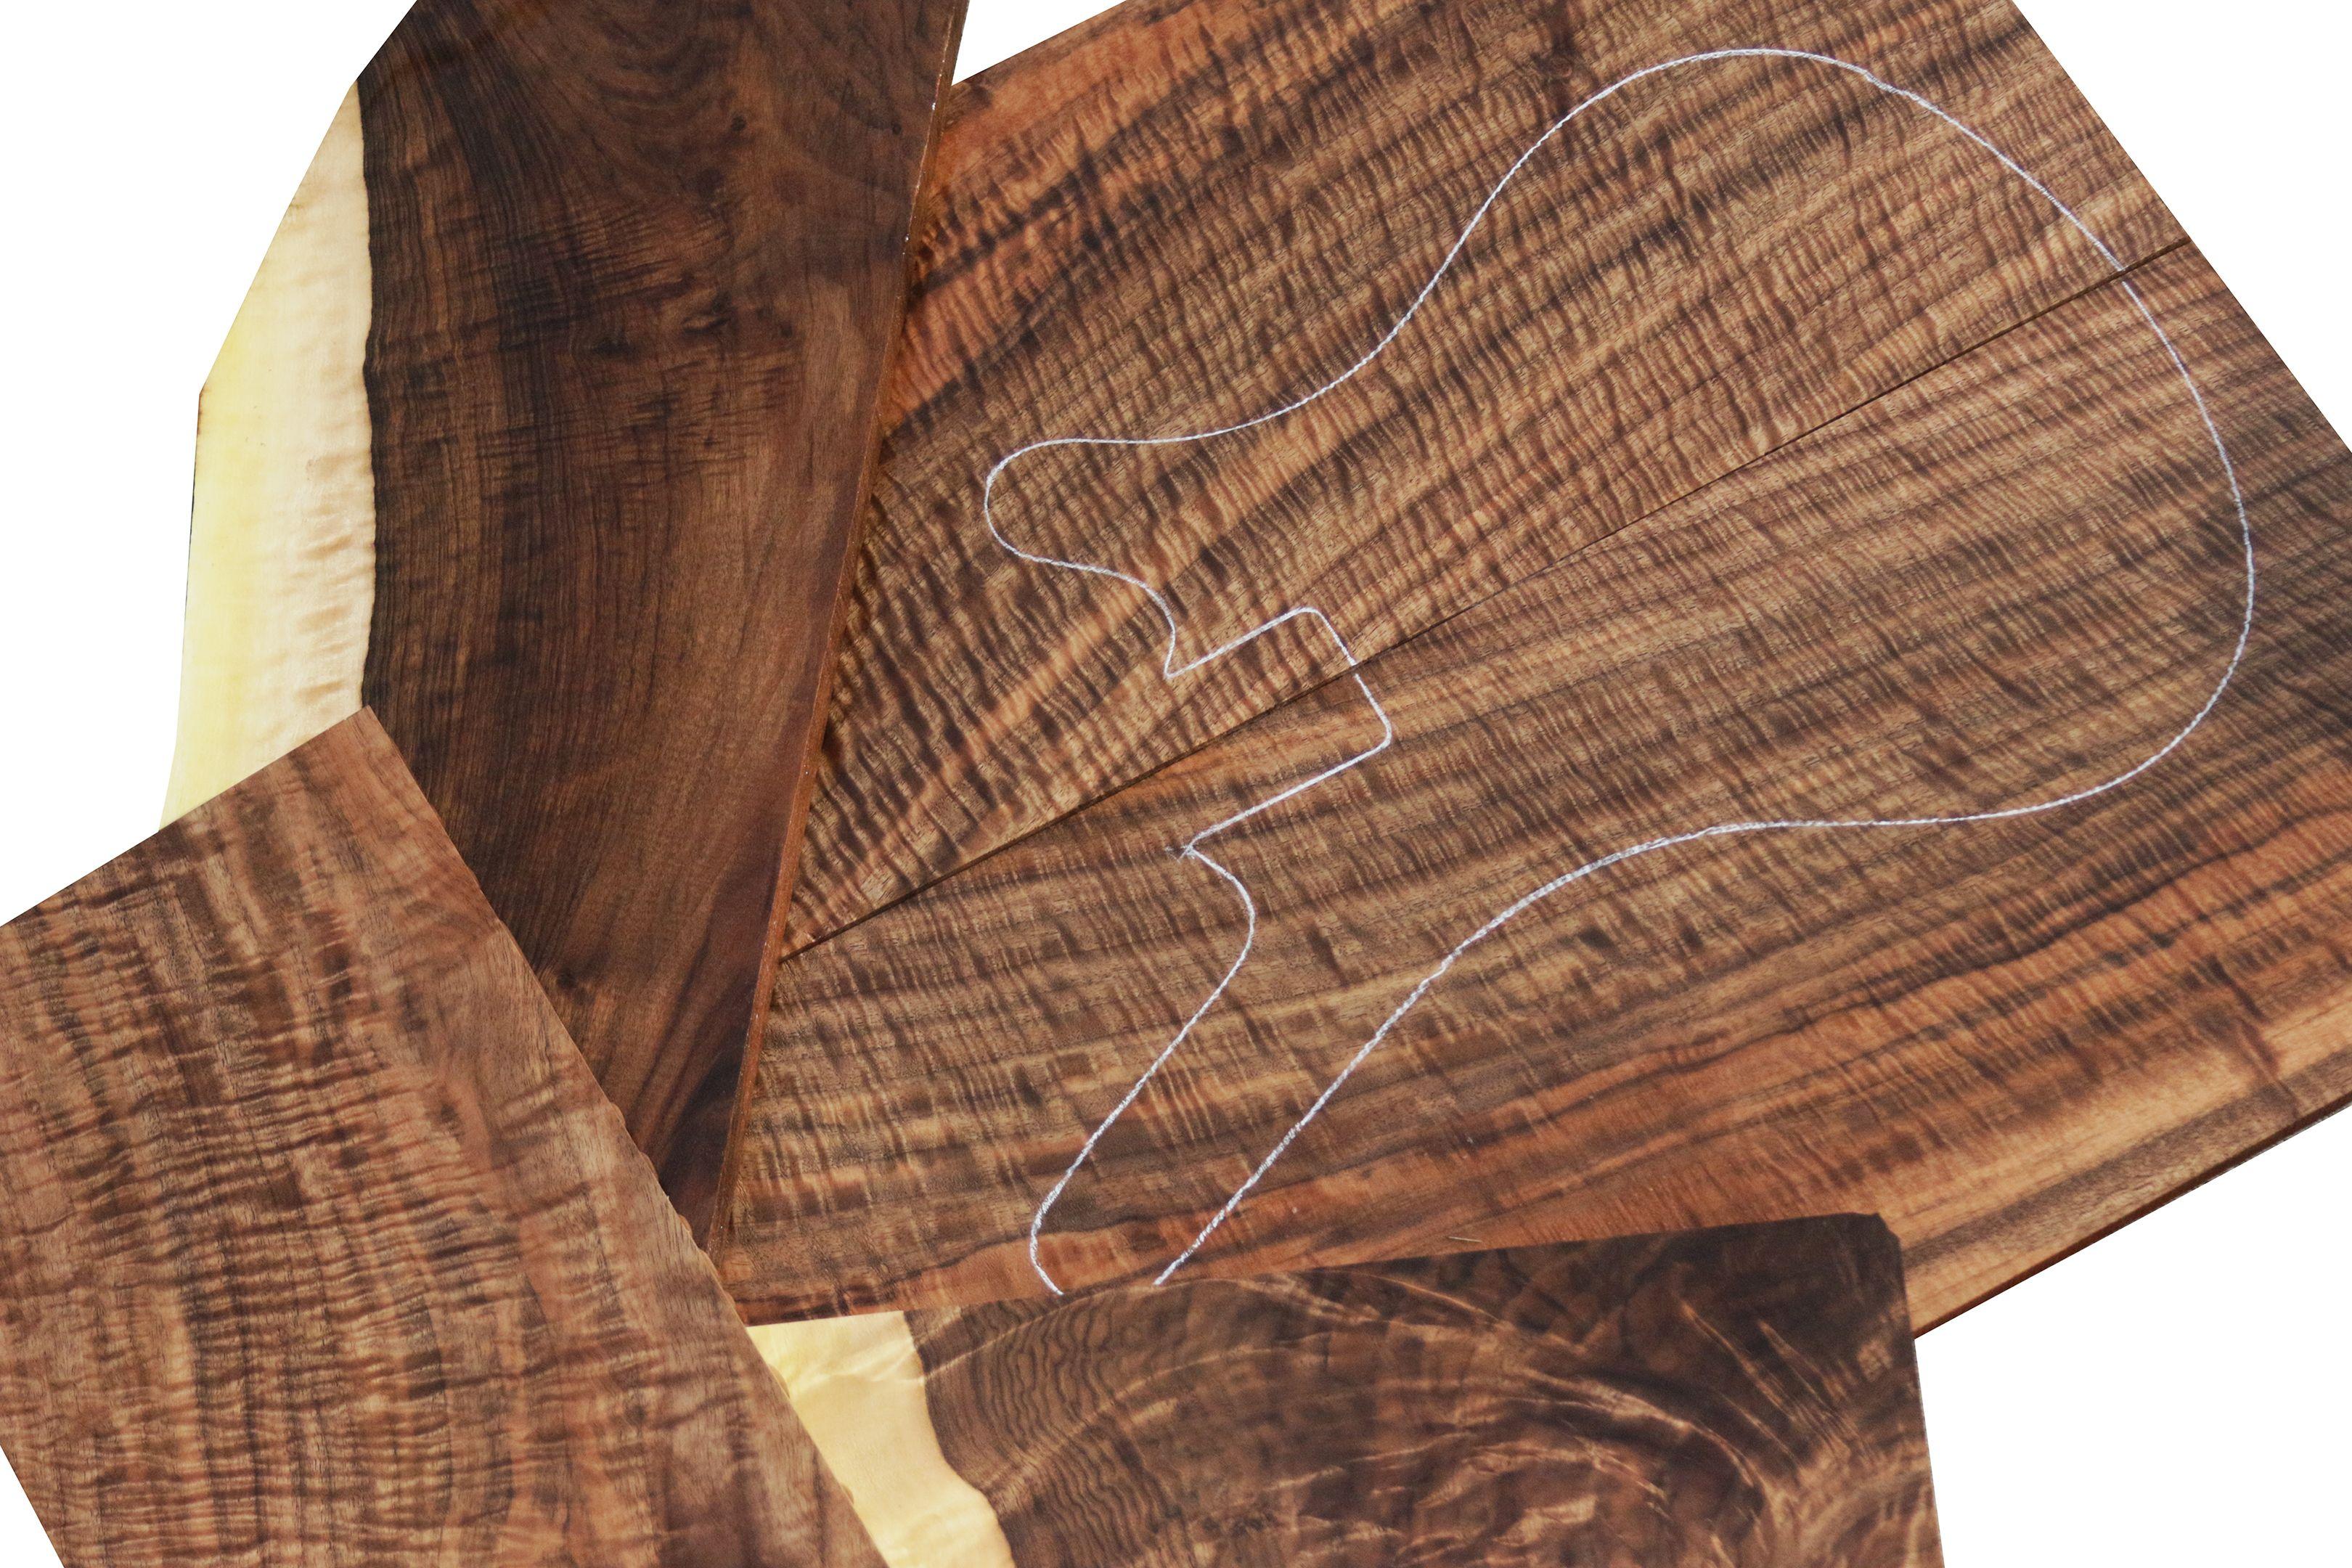 Bastogne Walnut Beautiful Wood Easy Woodworking Projects Woodworking